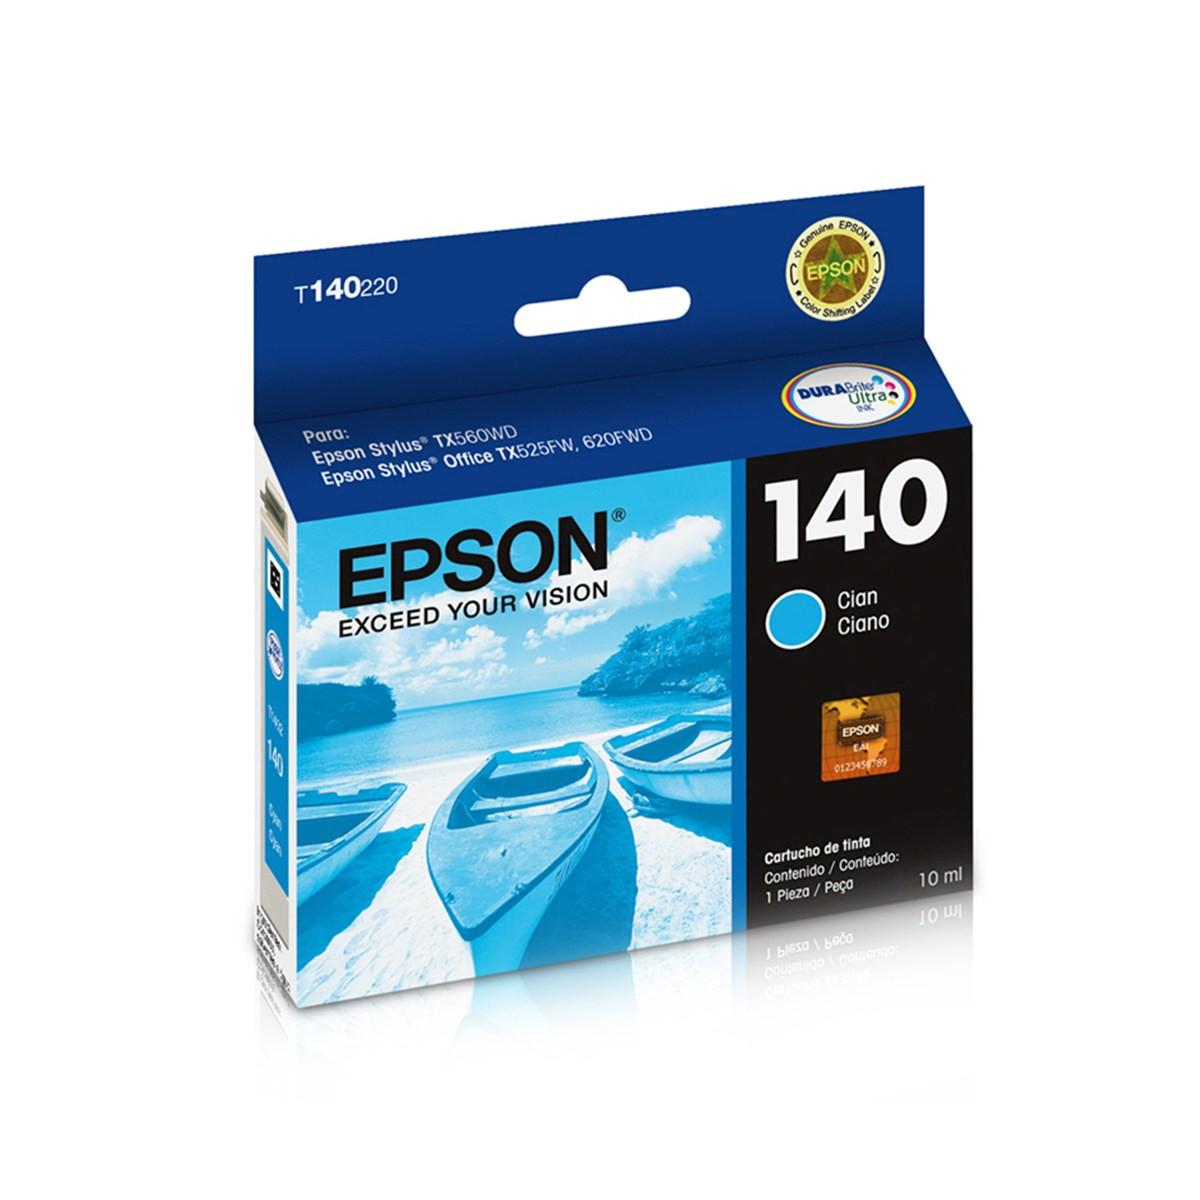 Cartucho de Tinta Epson T140 T140220 T1402 Ciano | TX560WD T42WD TX620FWD | Original 10 ml